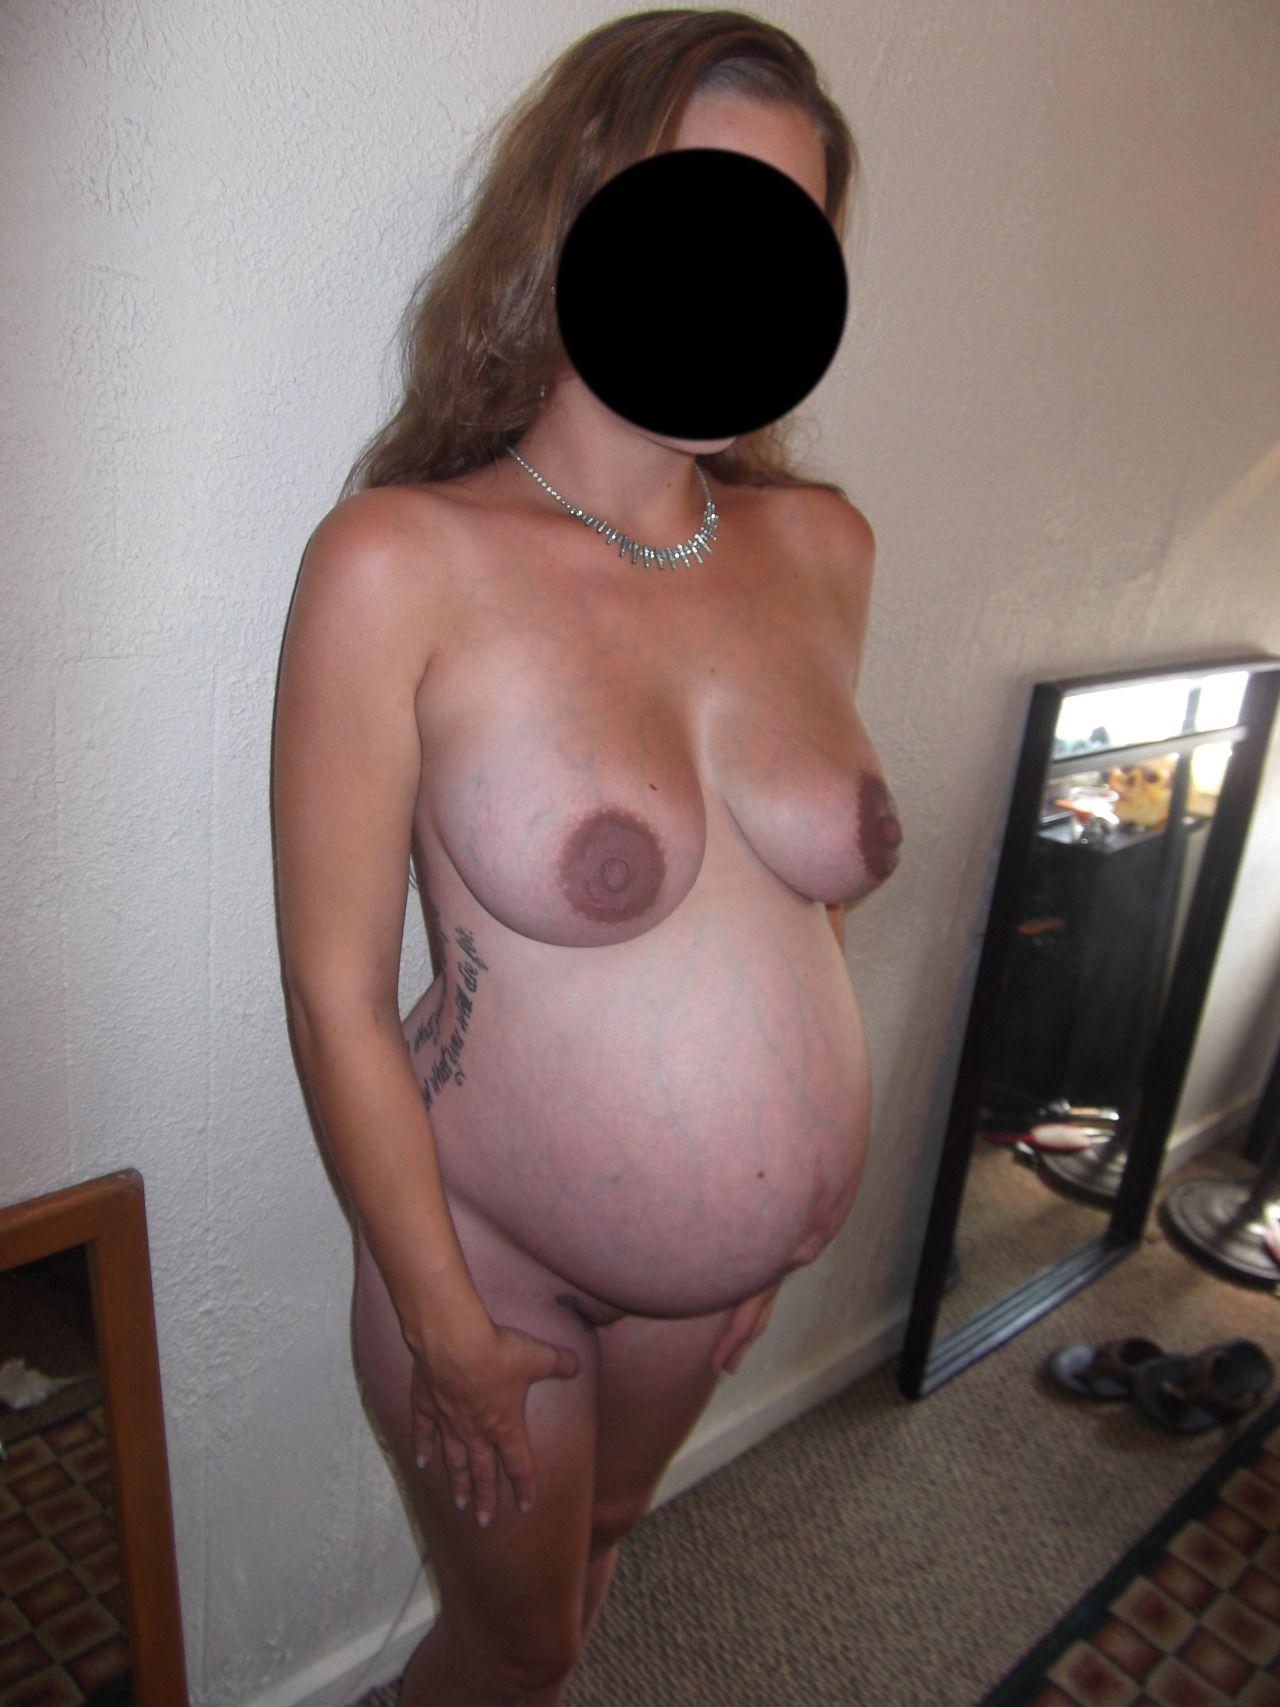 porno enceinte escorte sexe fr